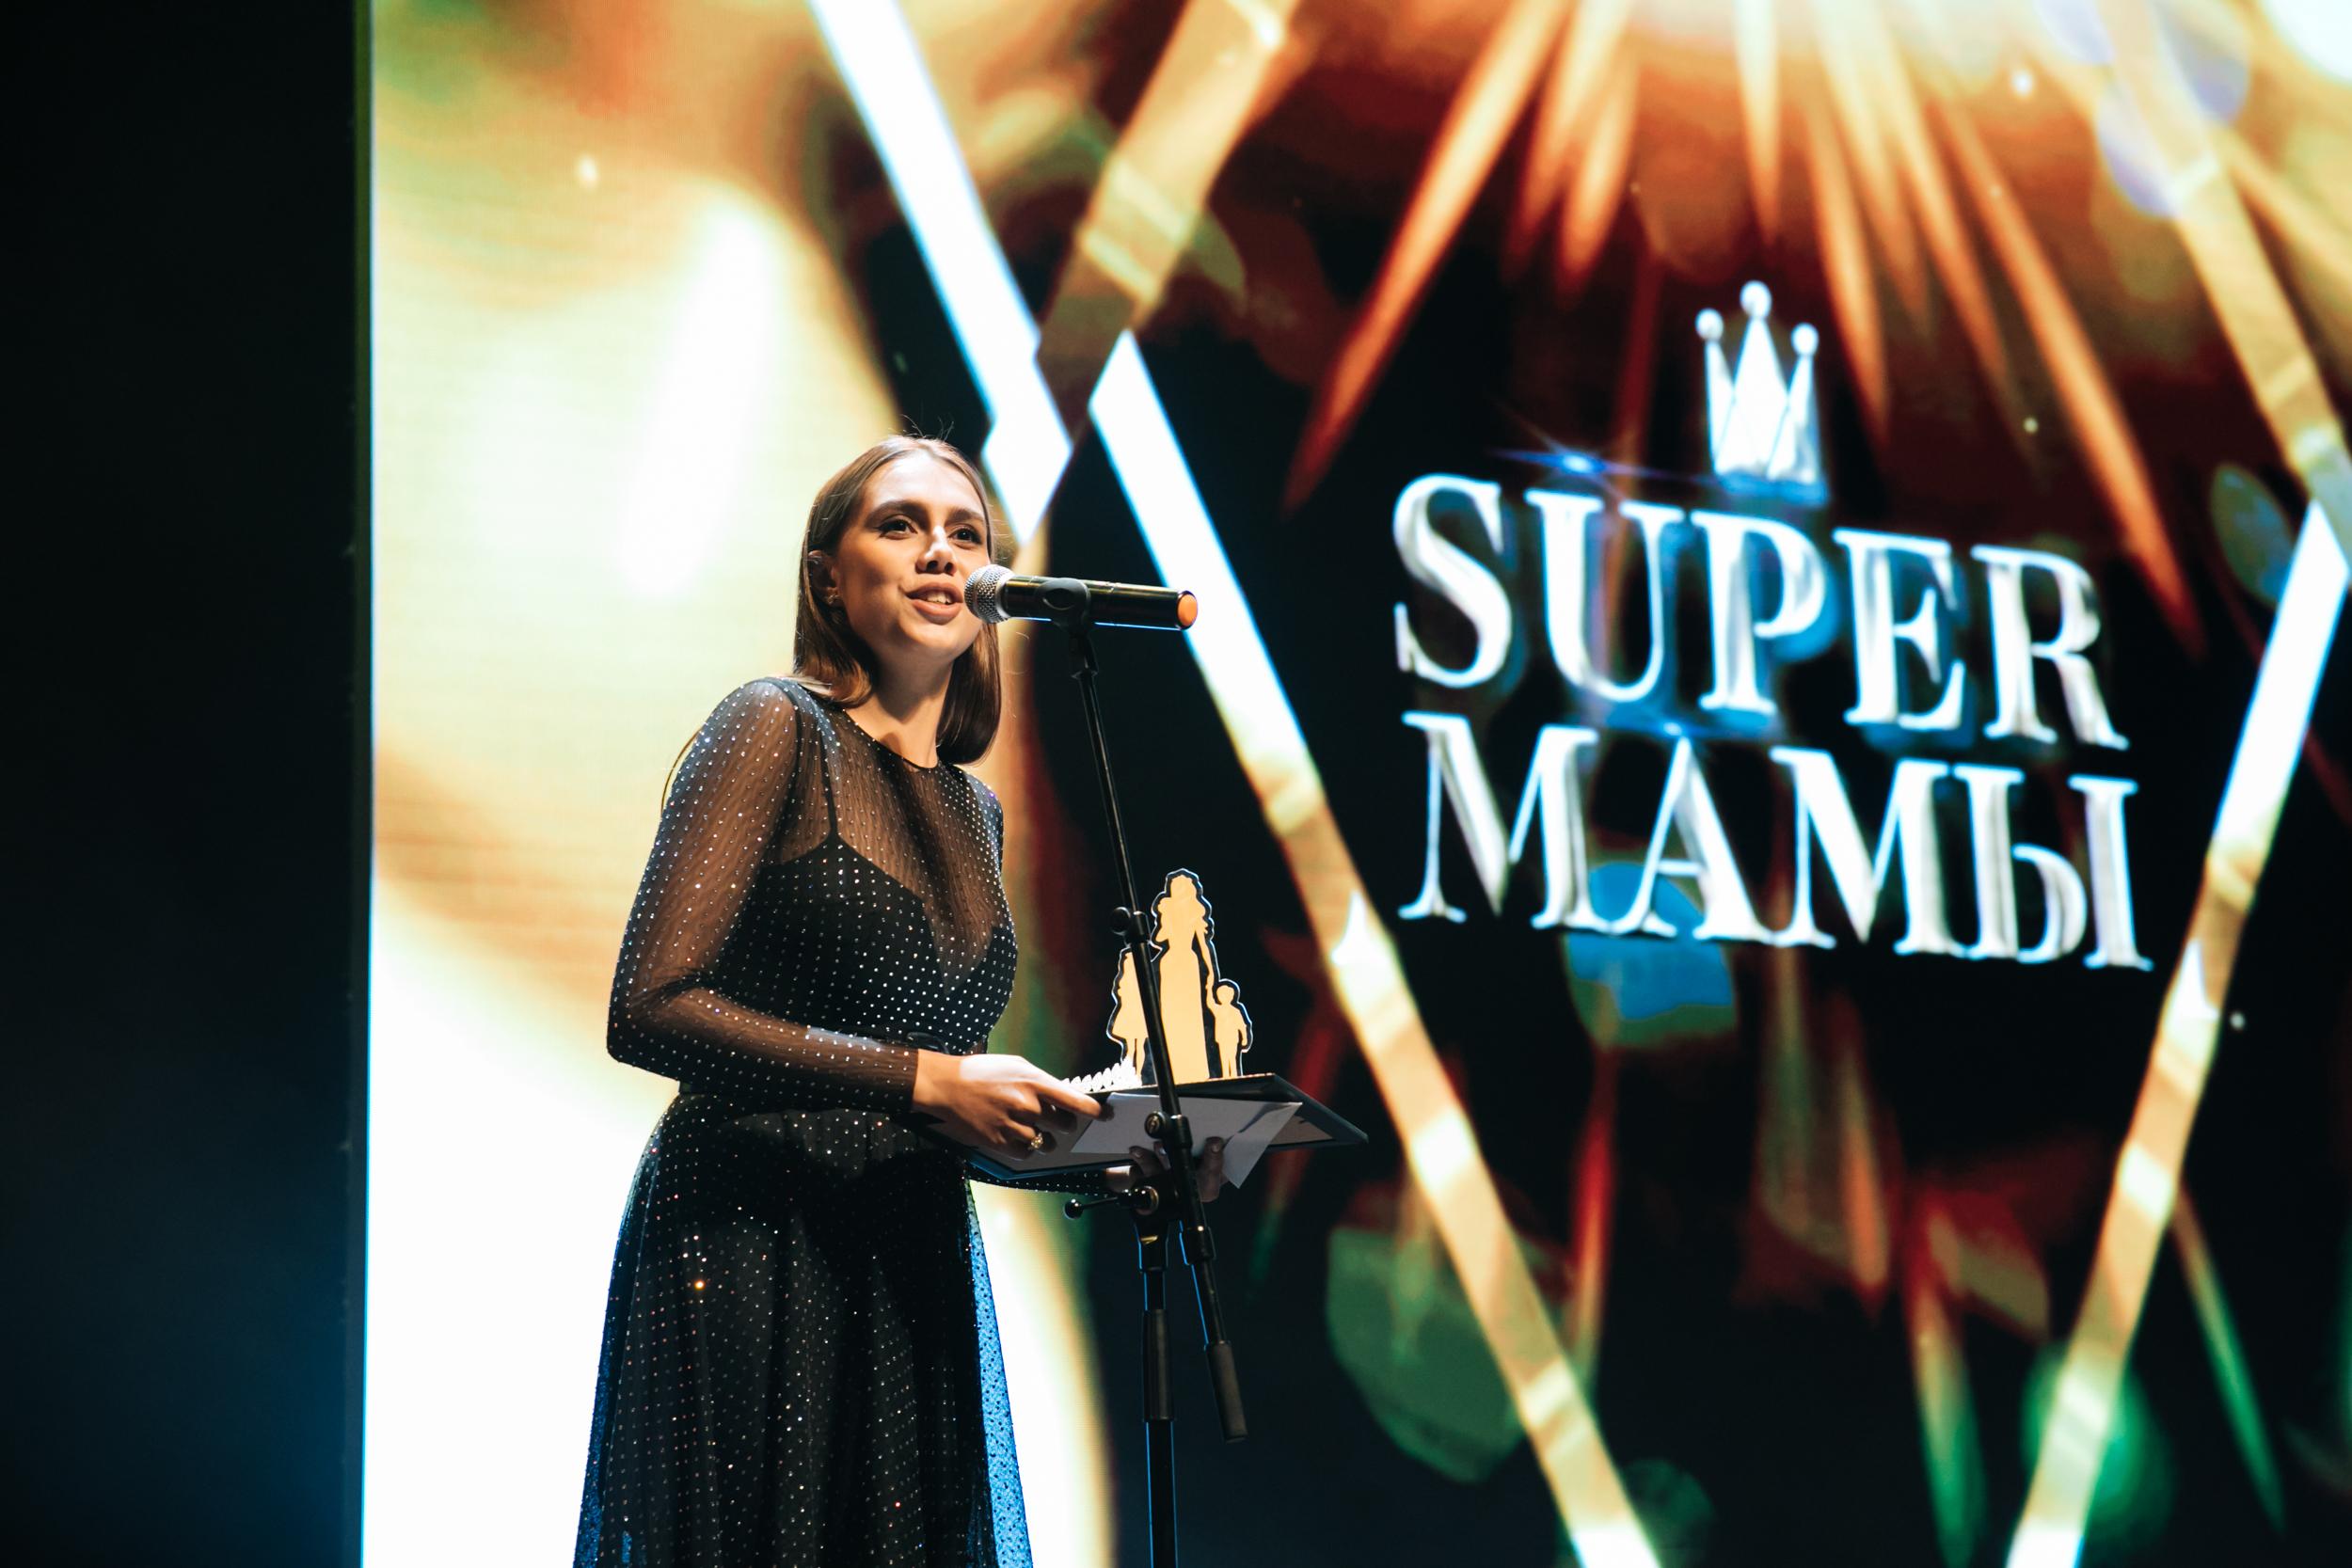 Национальная премия «SUPER МАМЫ ГОДА» 2020 Барвиха Luxury Village